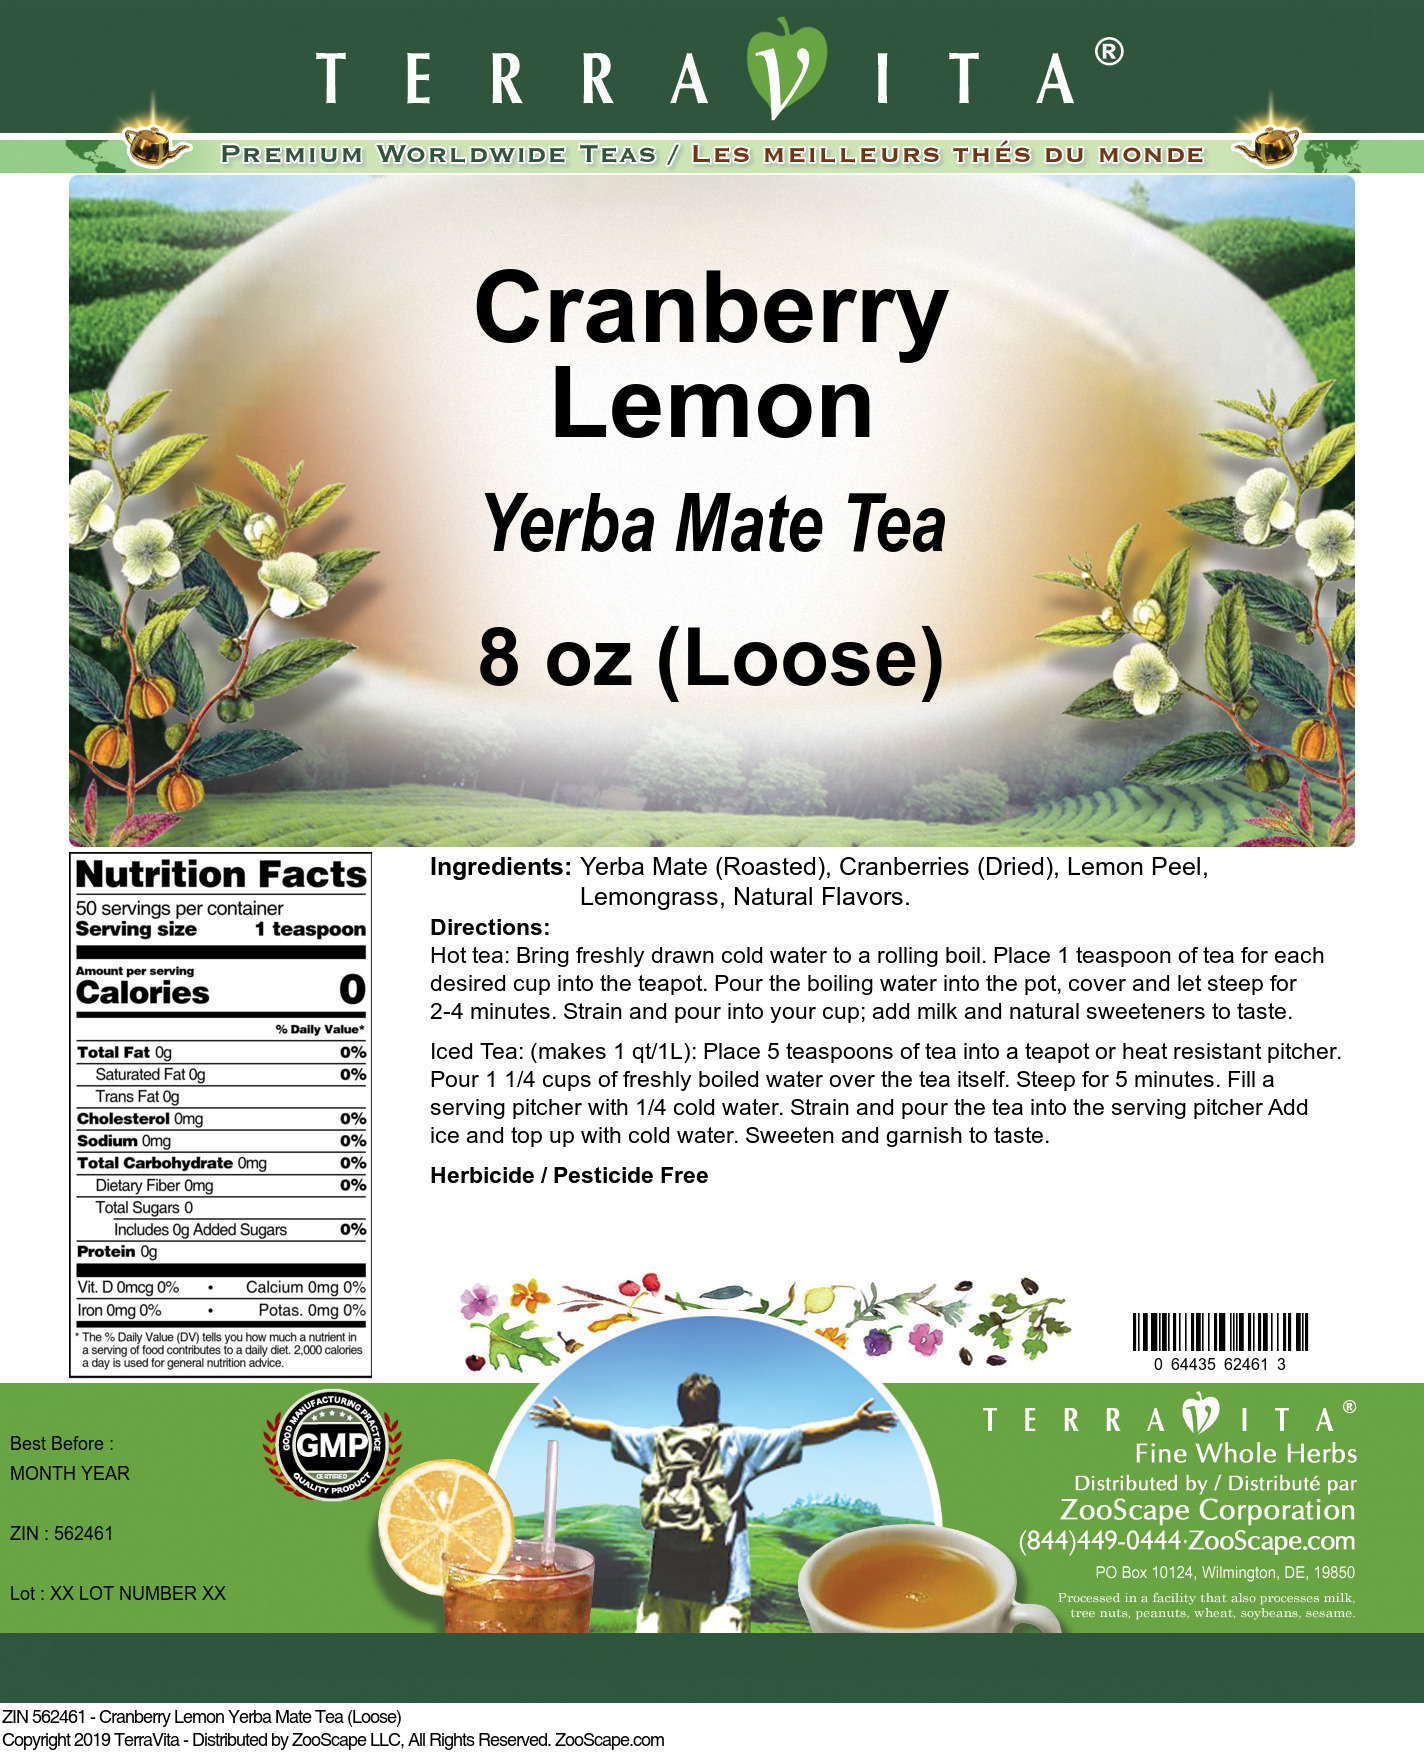 Cranberry Lemon Yerba Mate Tea (Loose)